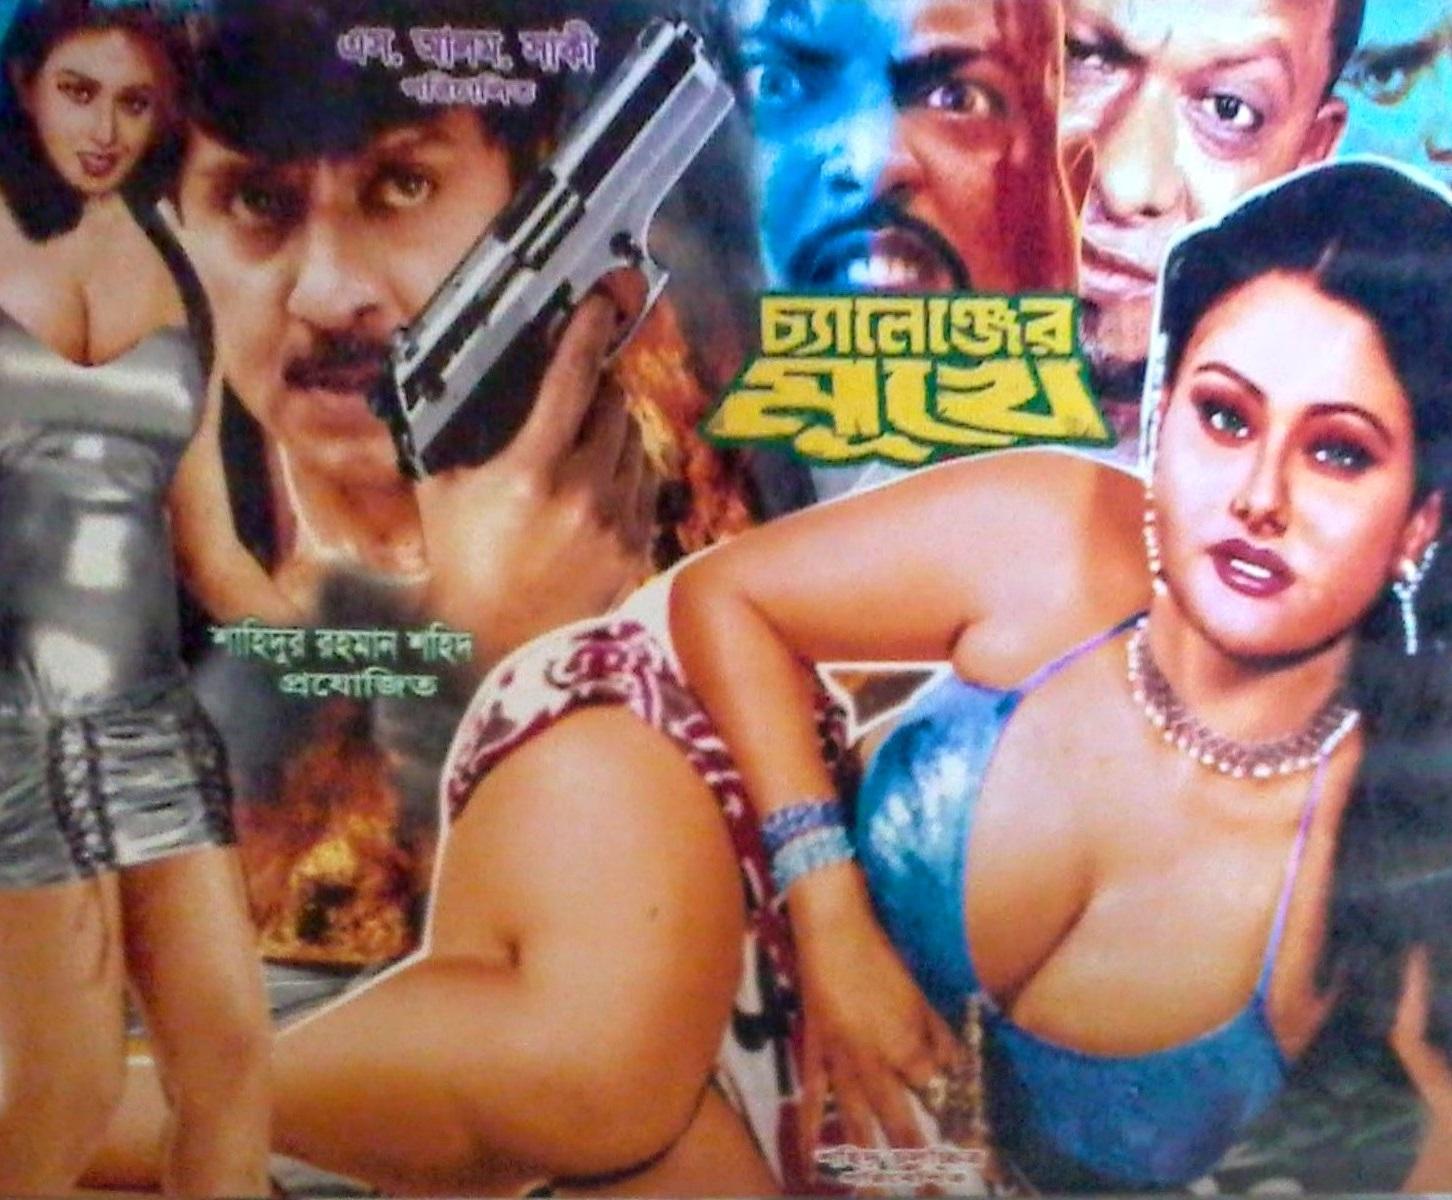 18+ Challenger Mukhe (2021) Bangla Full Hot Movie 720p | 480p HDRip x265 AAC 700MB